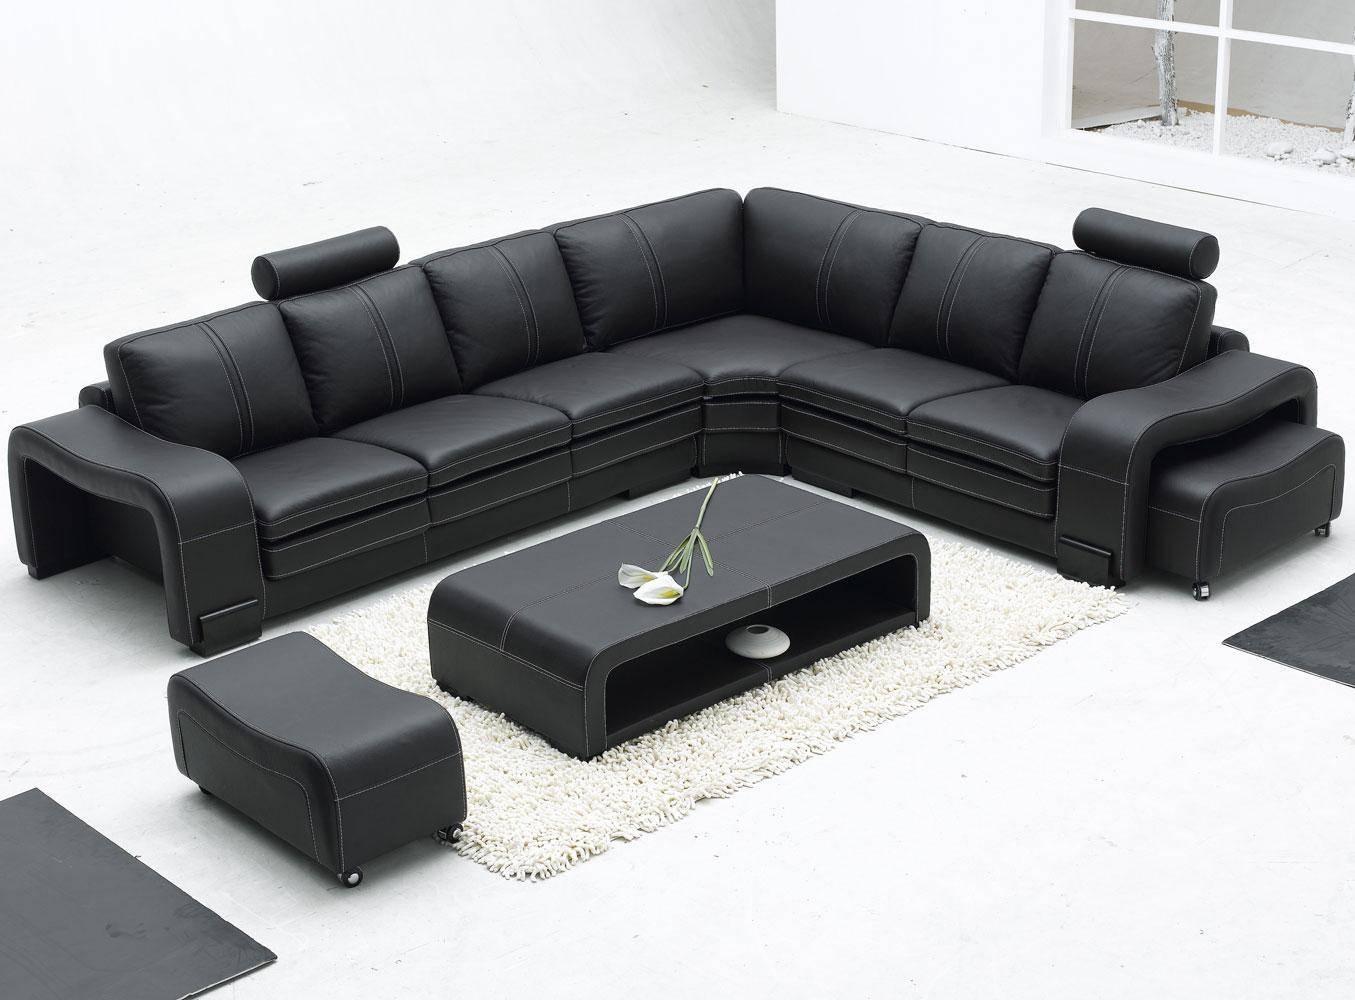 Modern Black Italian Leather Sectional Sofa - S3Net - Sectional with regard to Black Leather Sectional Sleeper Sofas (Image 20 of 30)